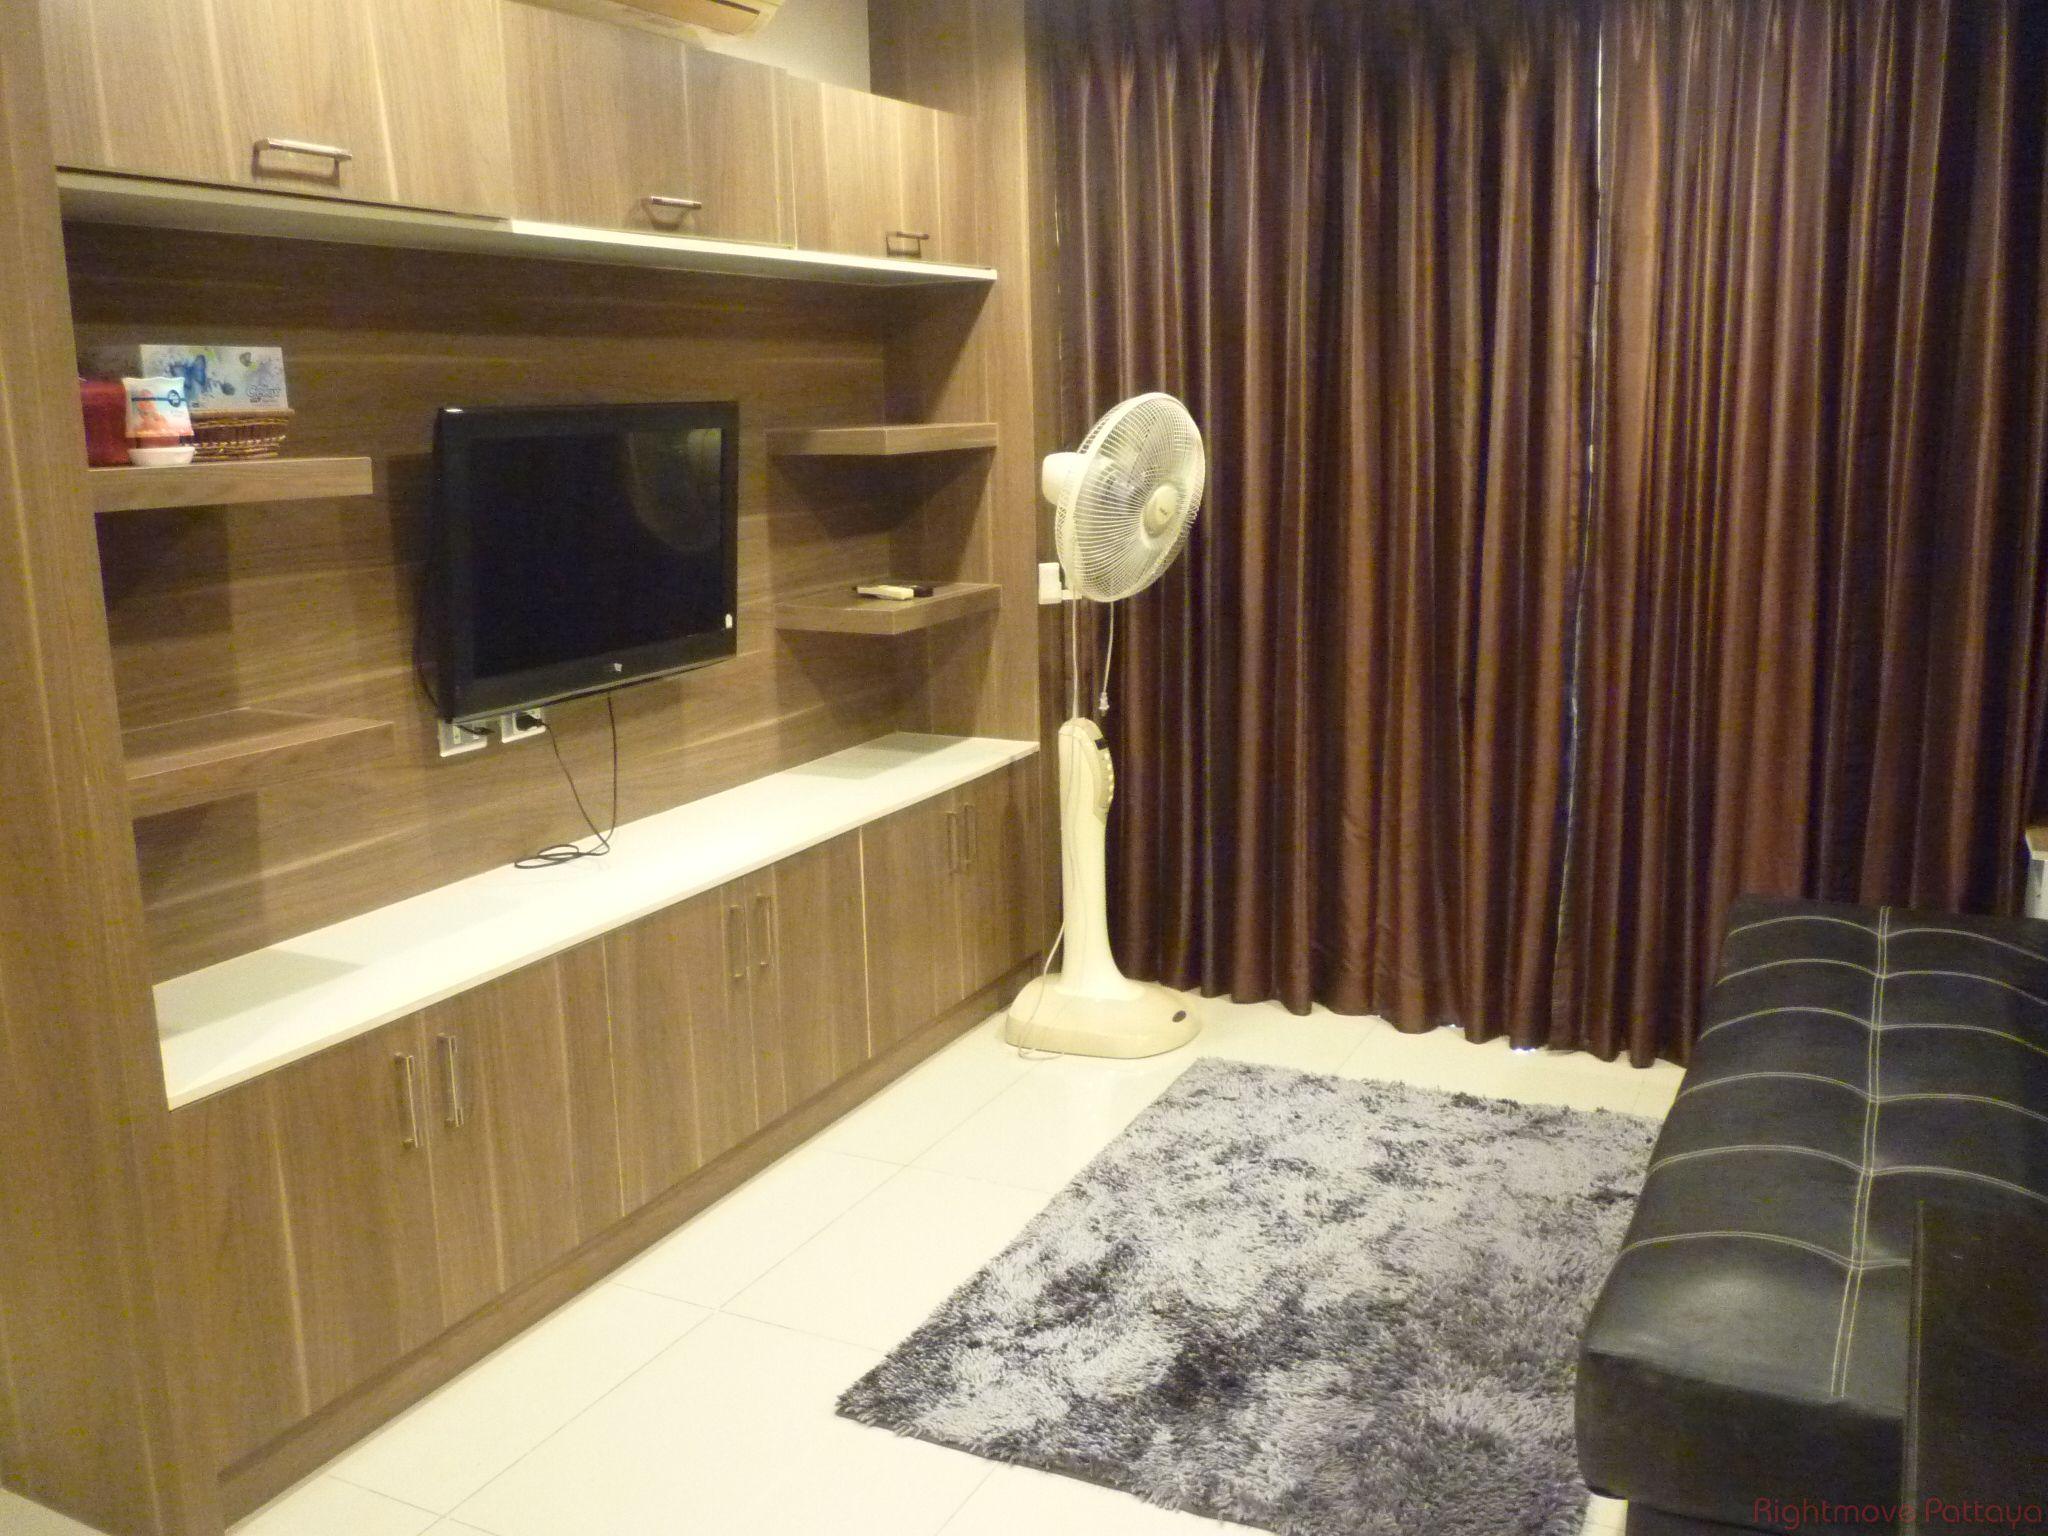 pic-4-Rightmove Pattaya Porchland 2 Jomtien Resort Condominiums for sale in Jomtien Pattaya